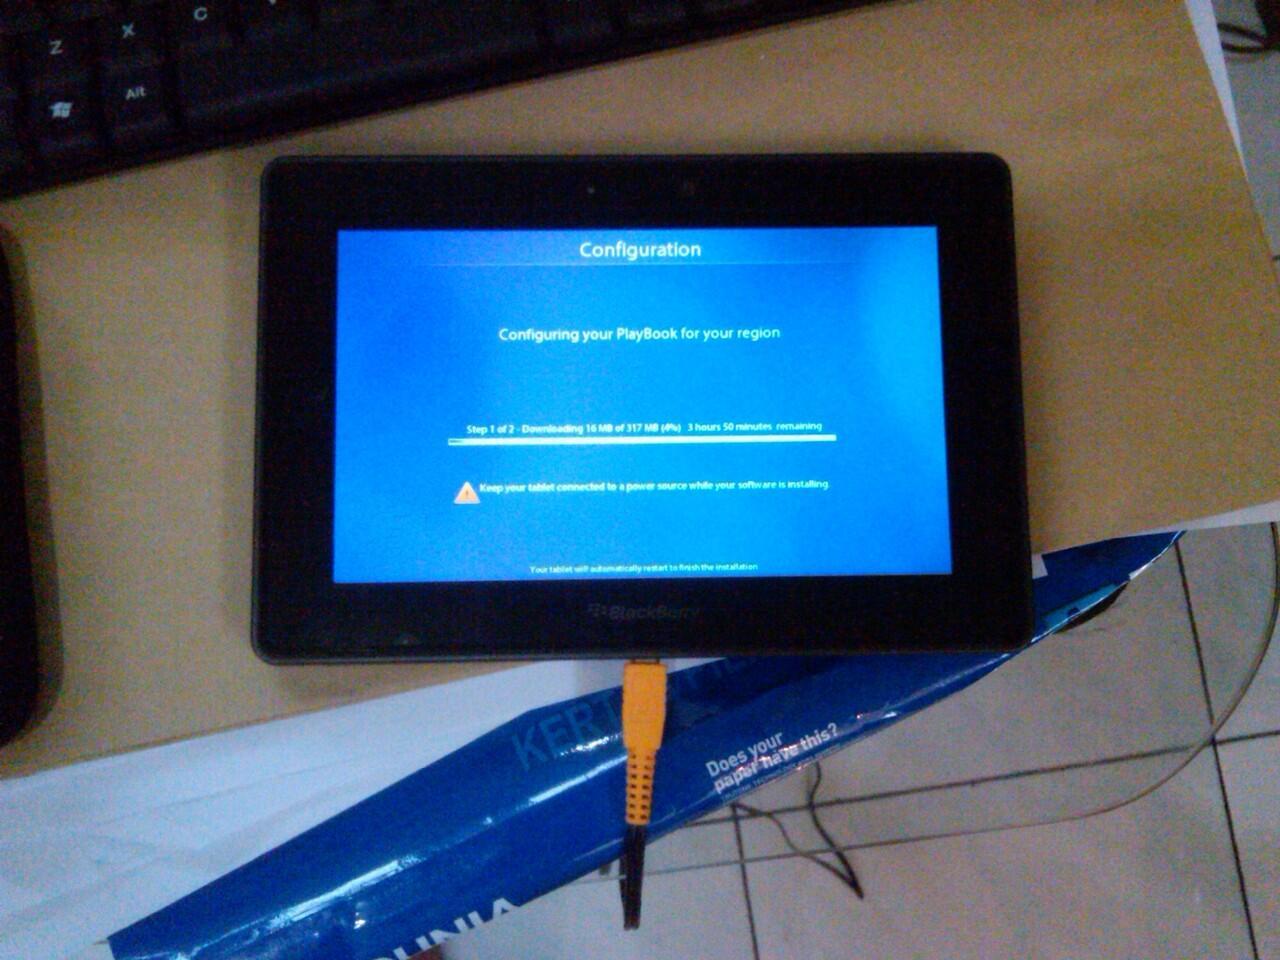 JUAL : Blackberry PLAYBOOK 64GB (TAM 17 bln)